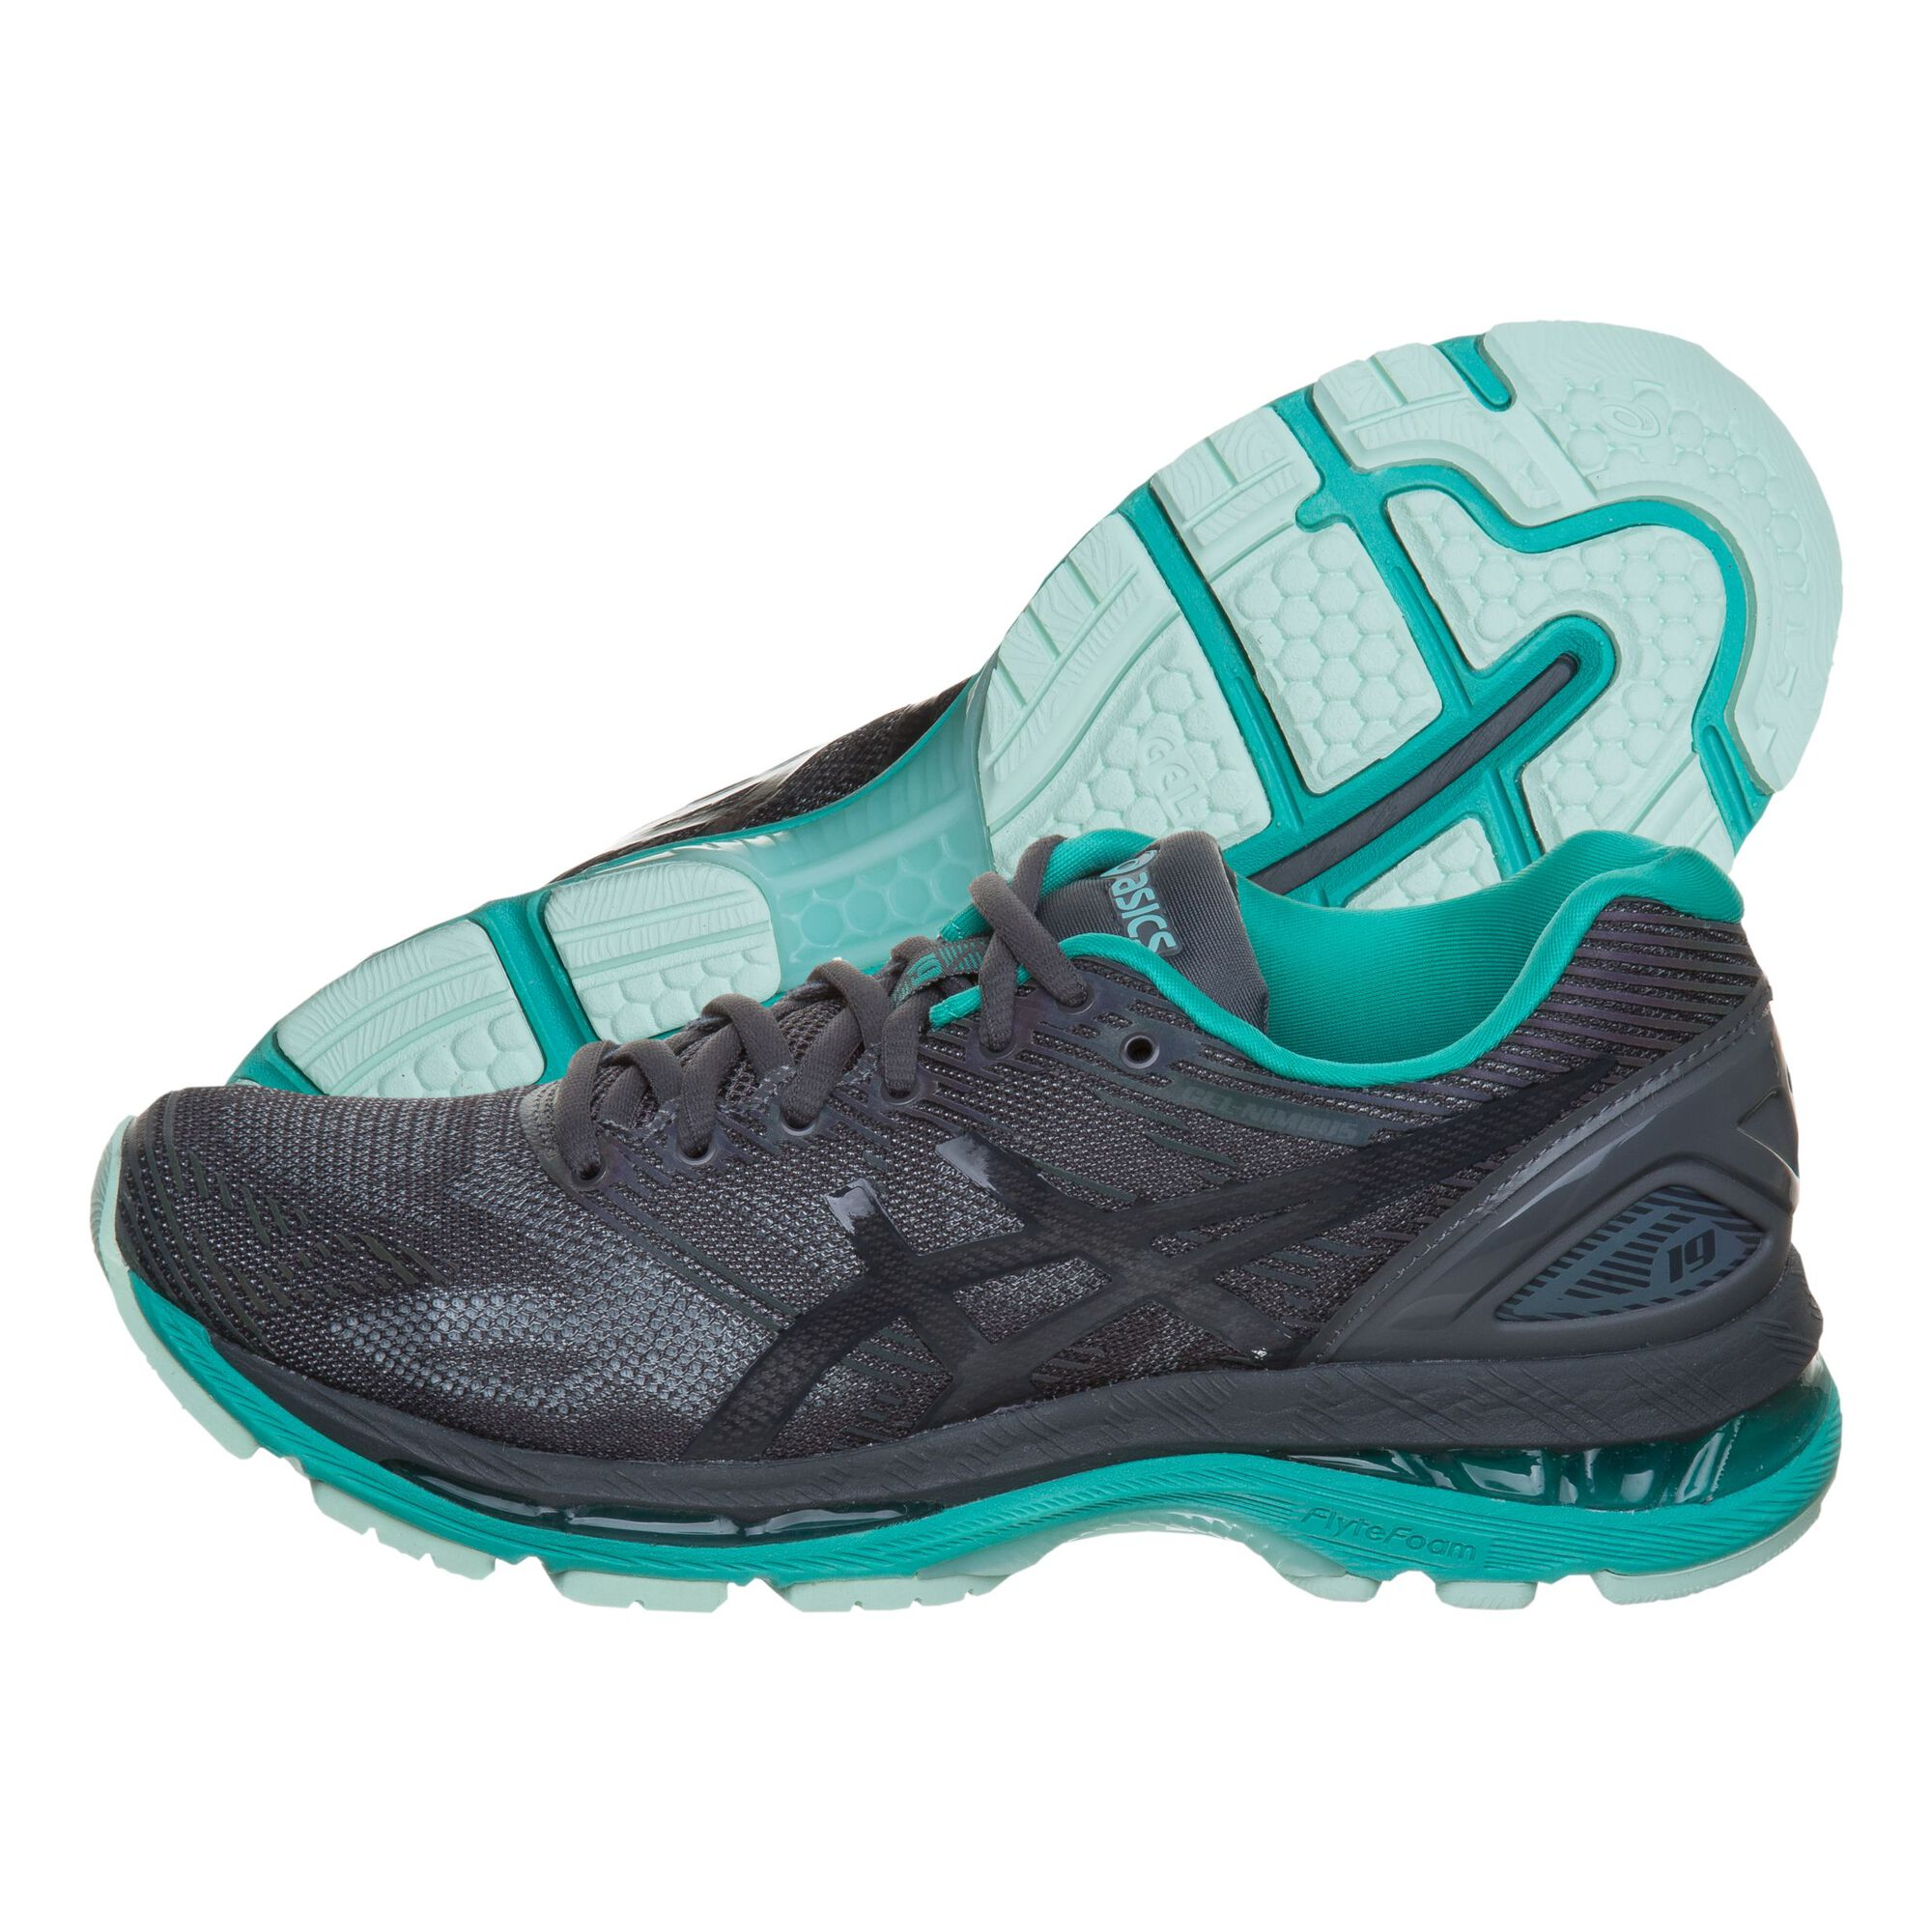 promo code 05ea1 2d00d www.jogging-point.co.uk/dw/image/v2/BBDP_PRD/on/de...